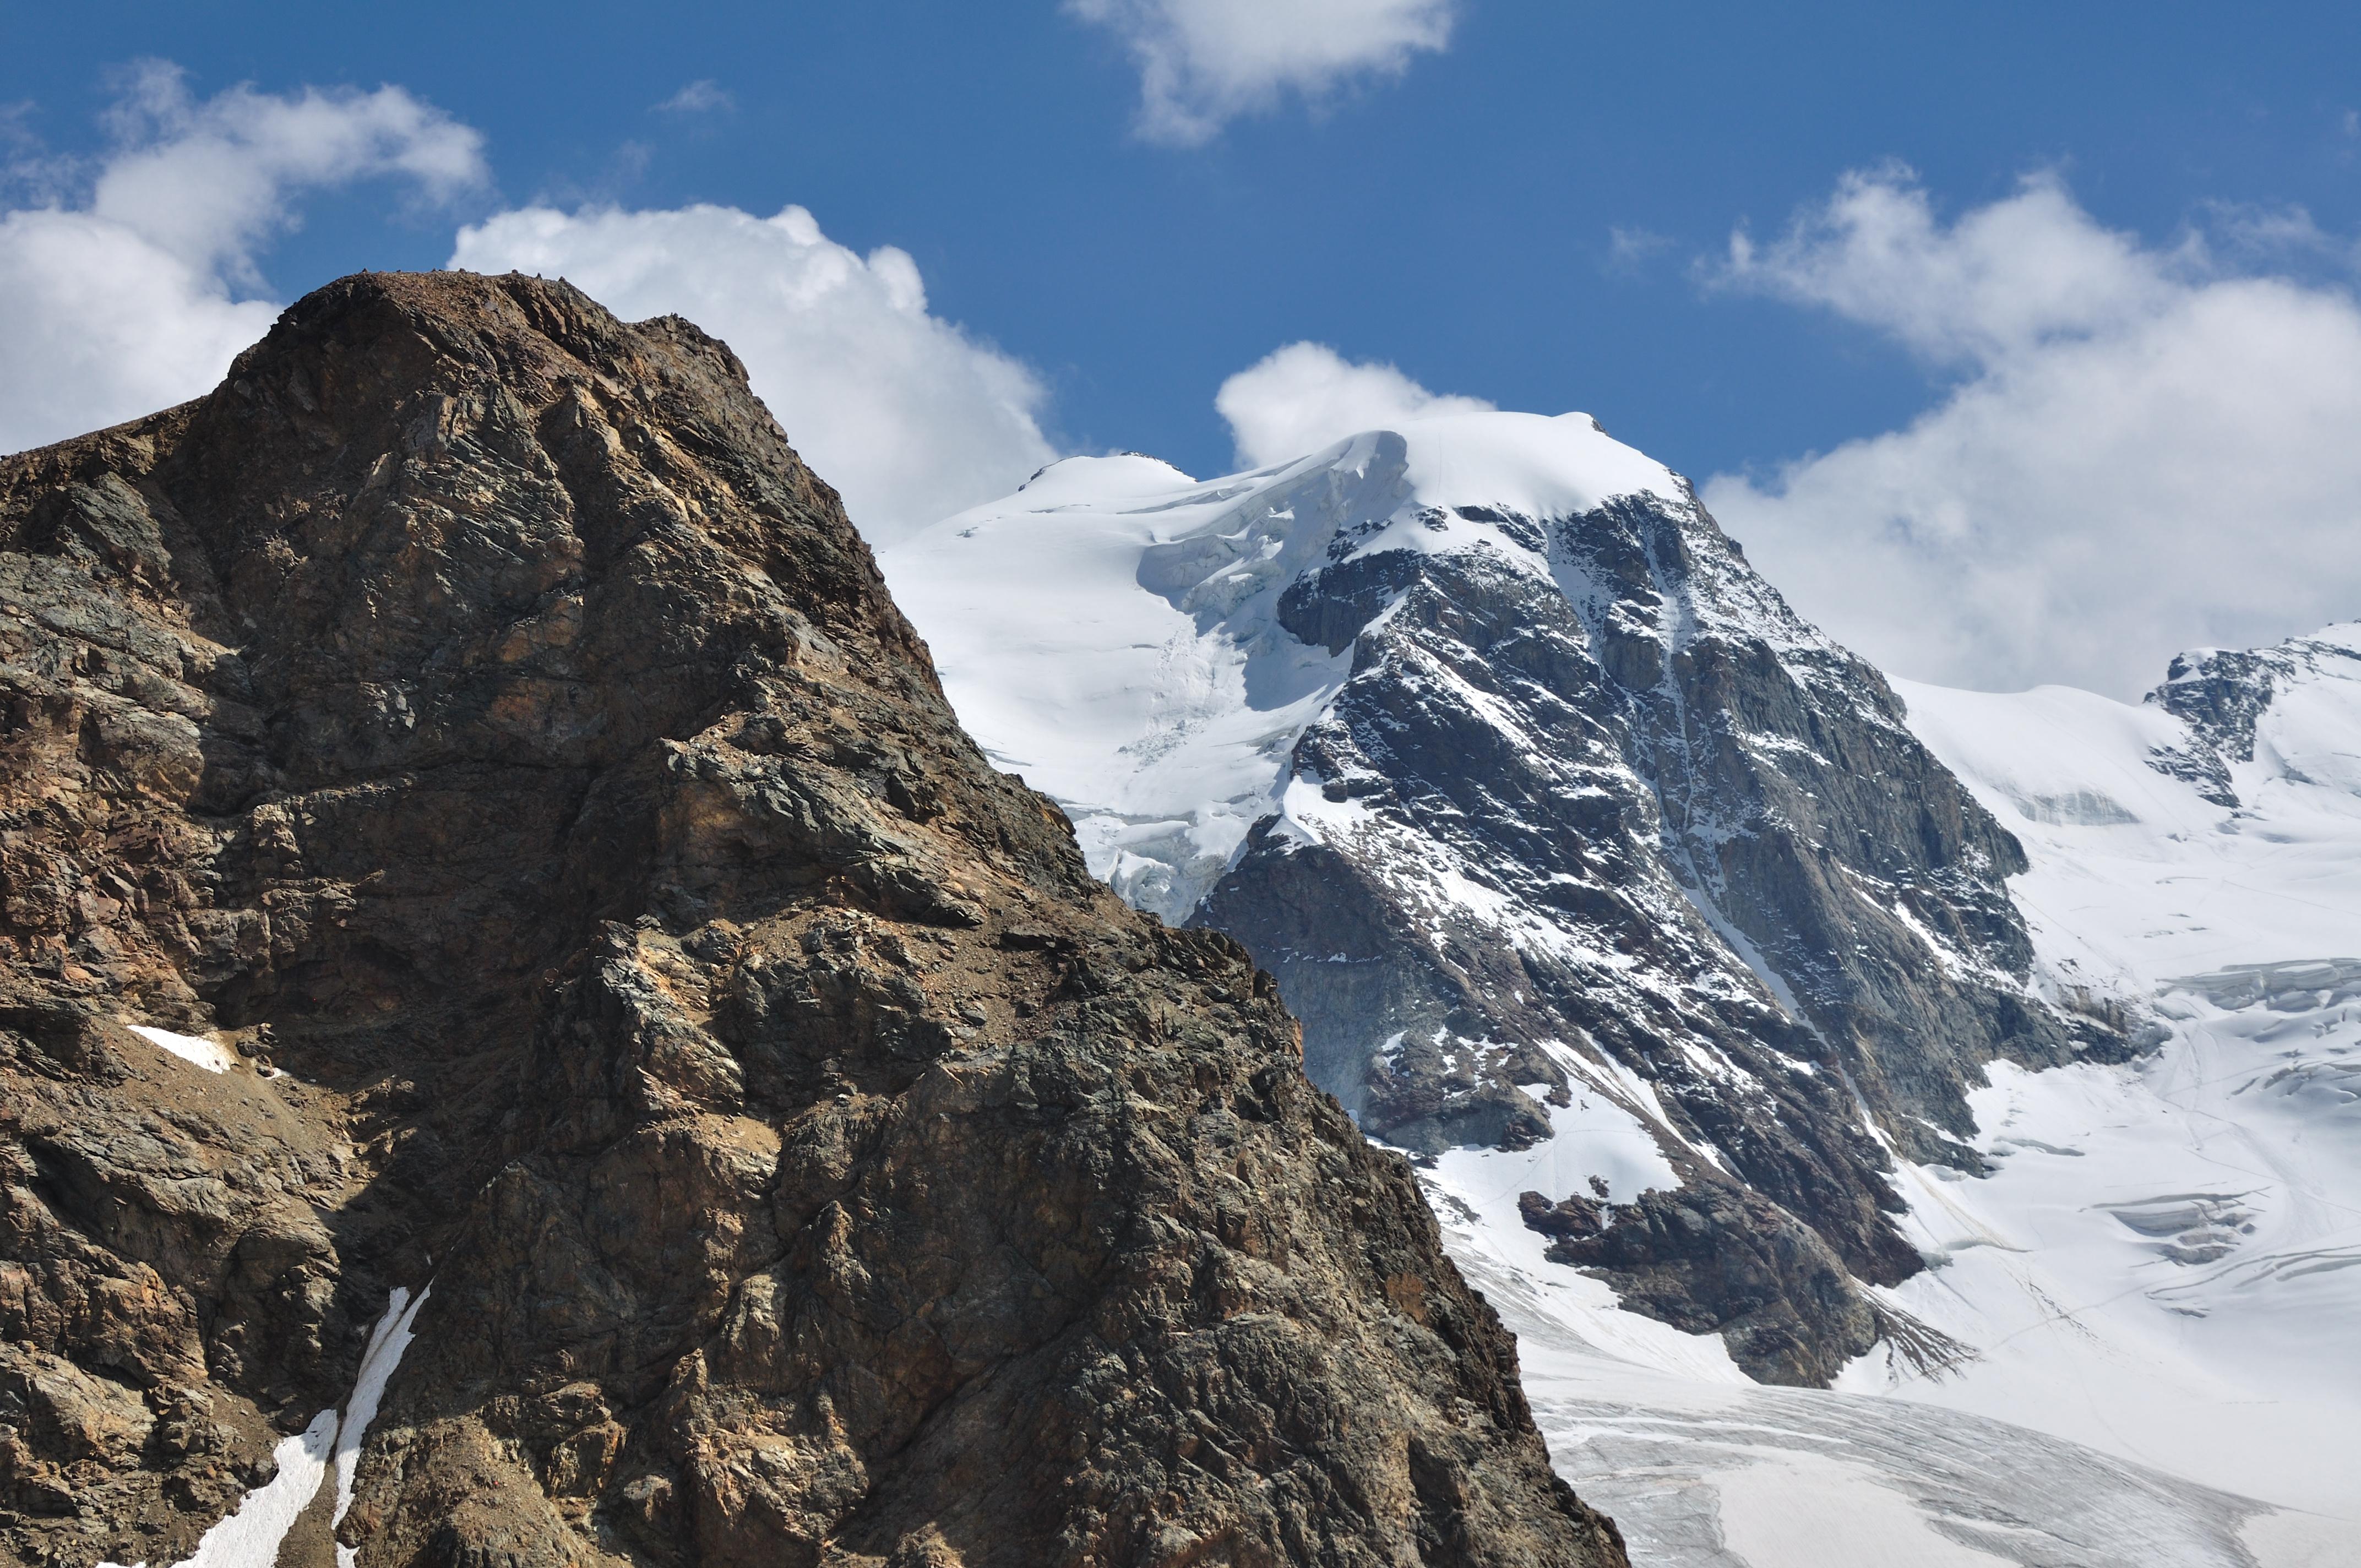 Klettersteig Piz Trovat : Piz trovat u wikipedia